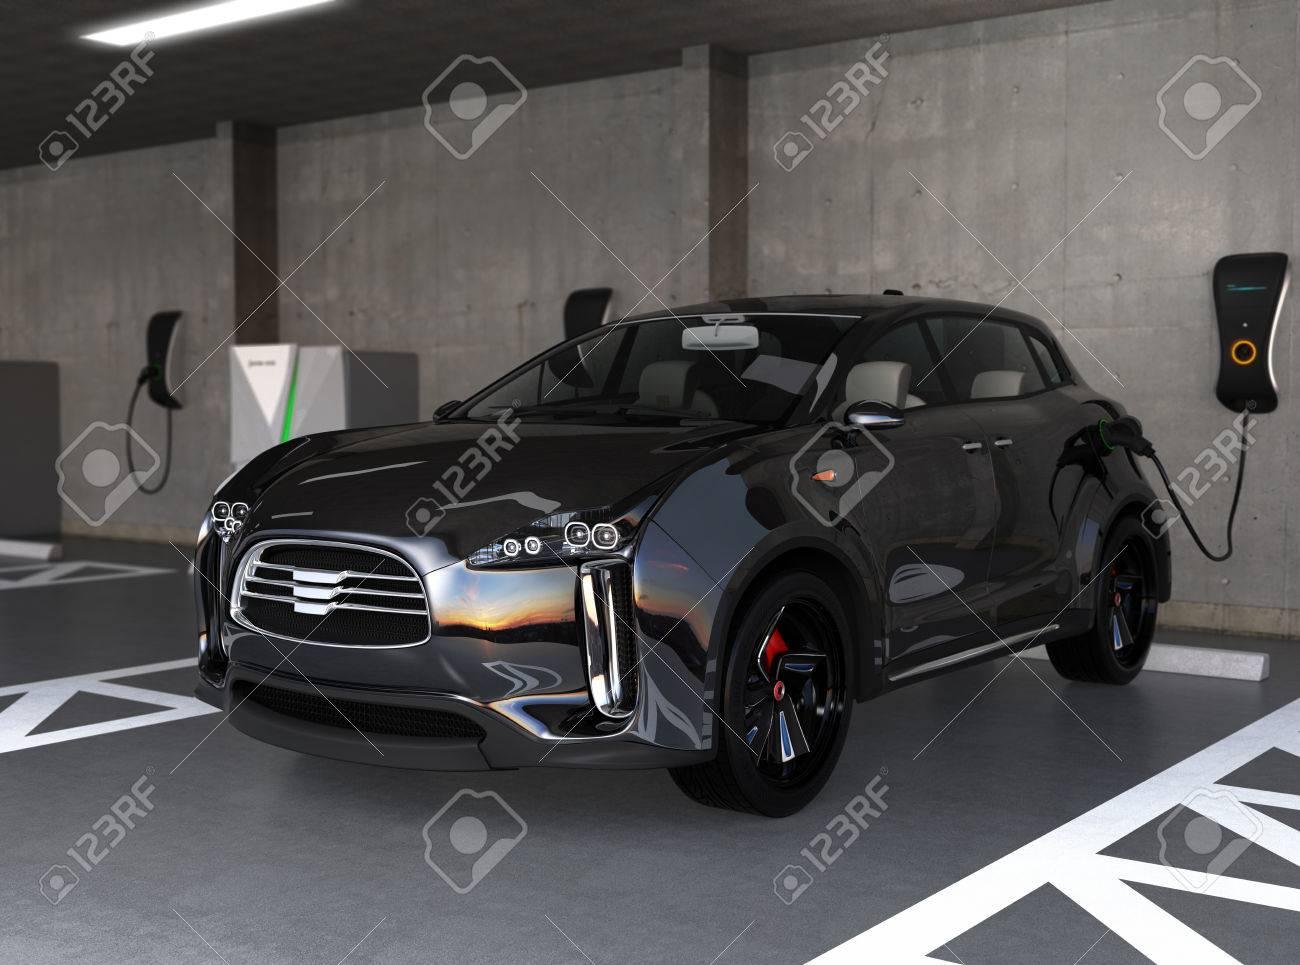 Black electric SUV recharging in parking garage. 3D rendering image. original design. - 65788206